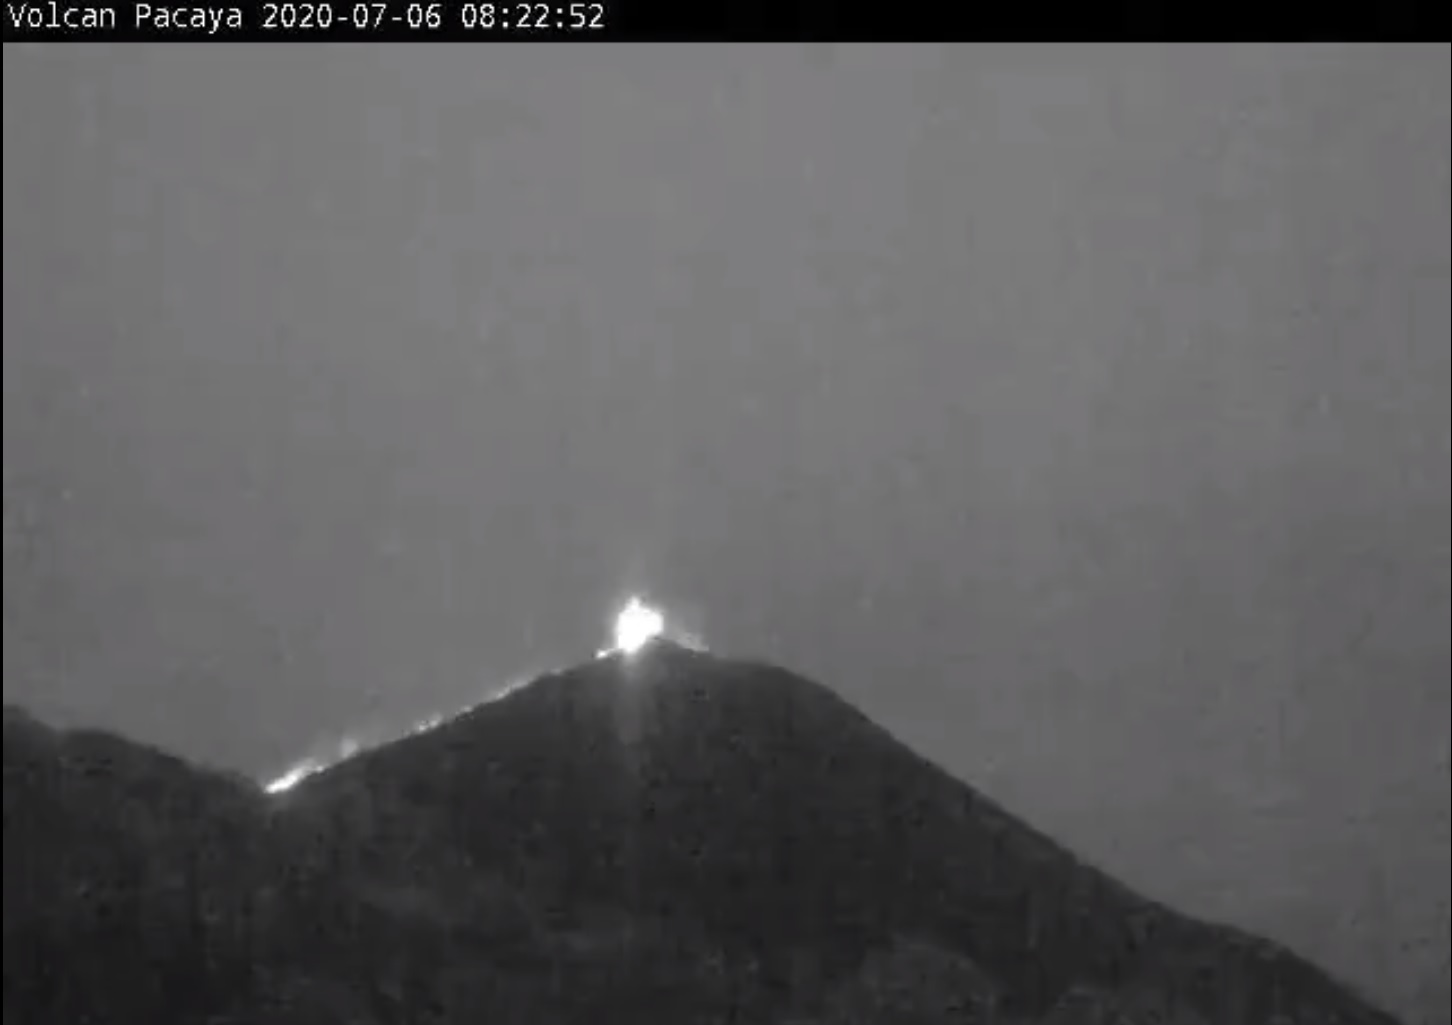 Lava flow from Pacaya volcano yesterday (image: INSIVUMEH)